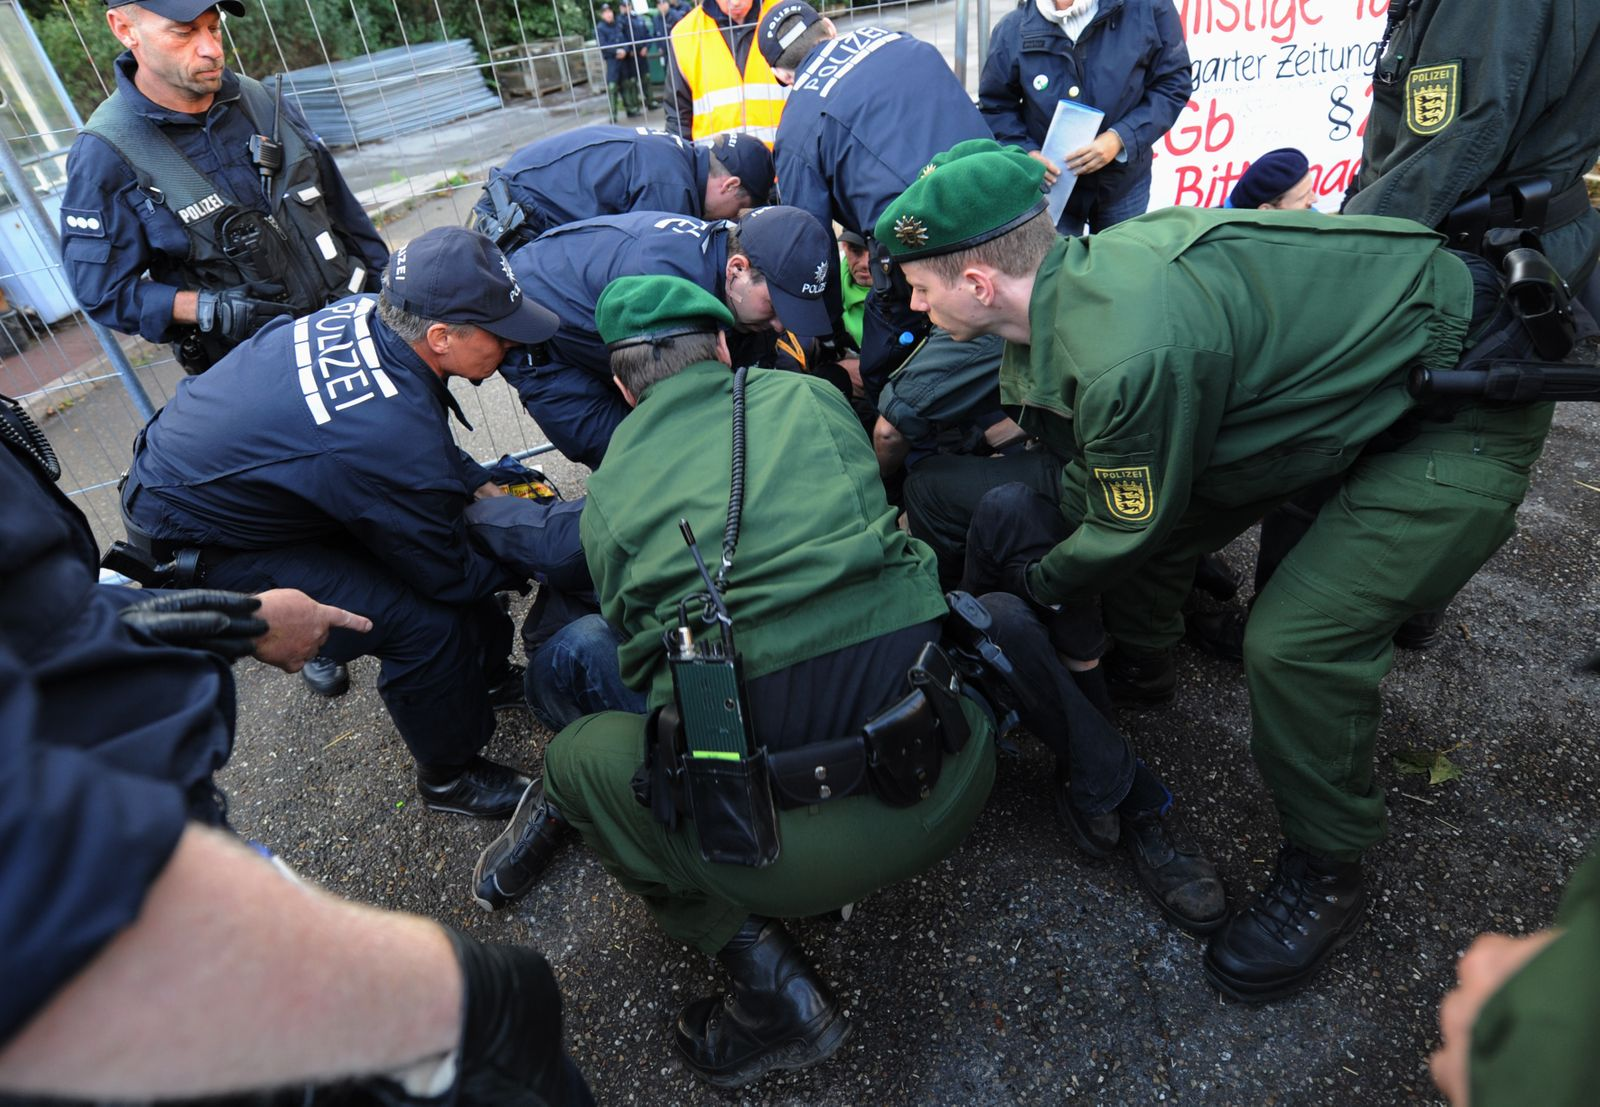 Stuttgart 21 - Blockade aufgehoben